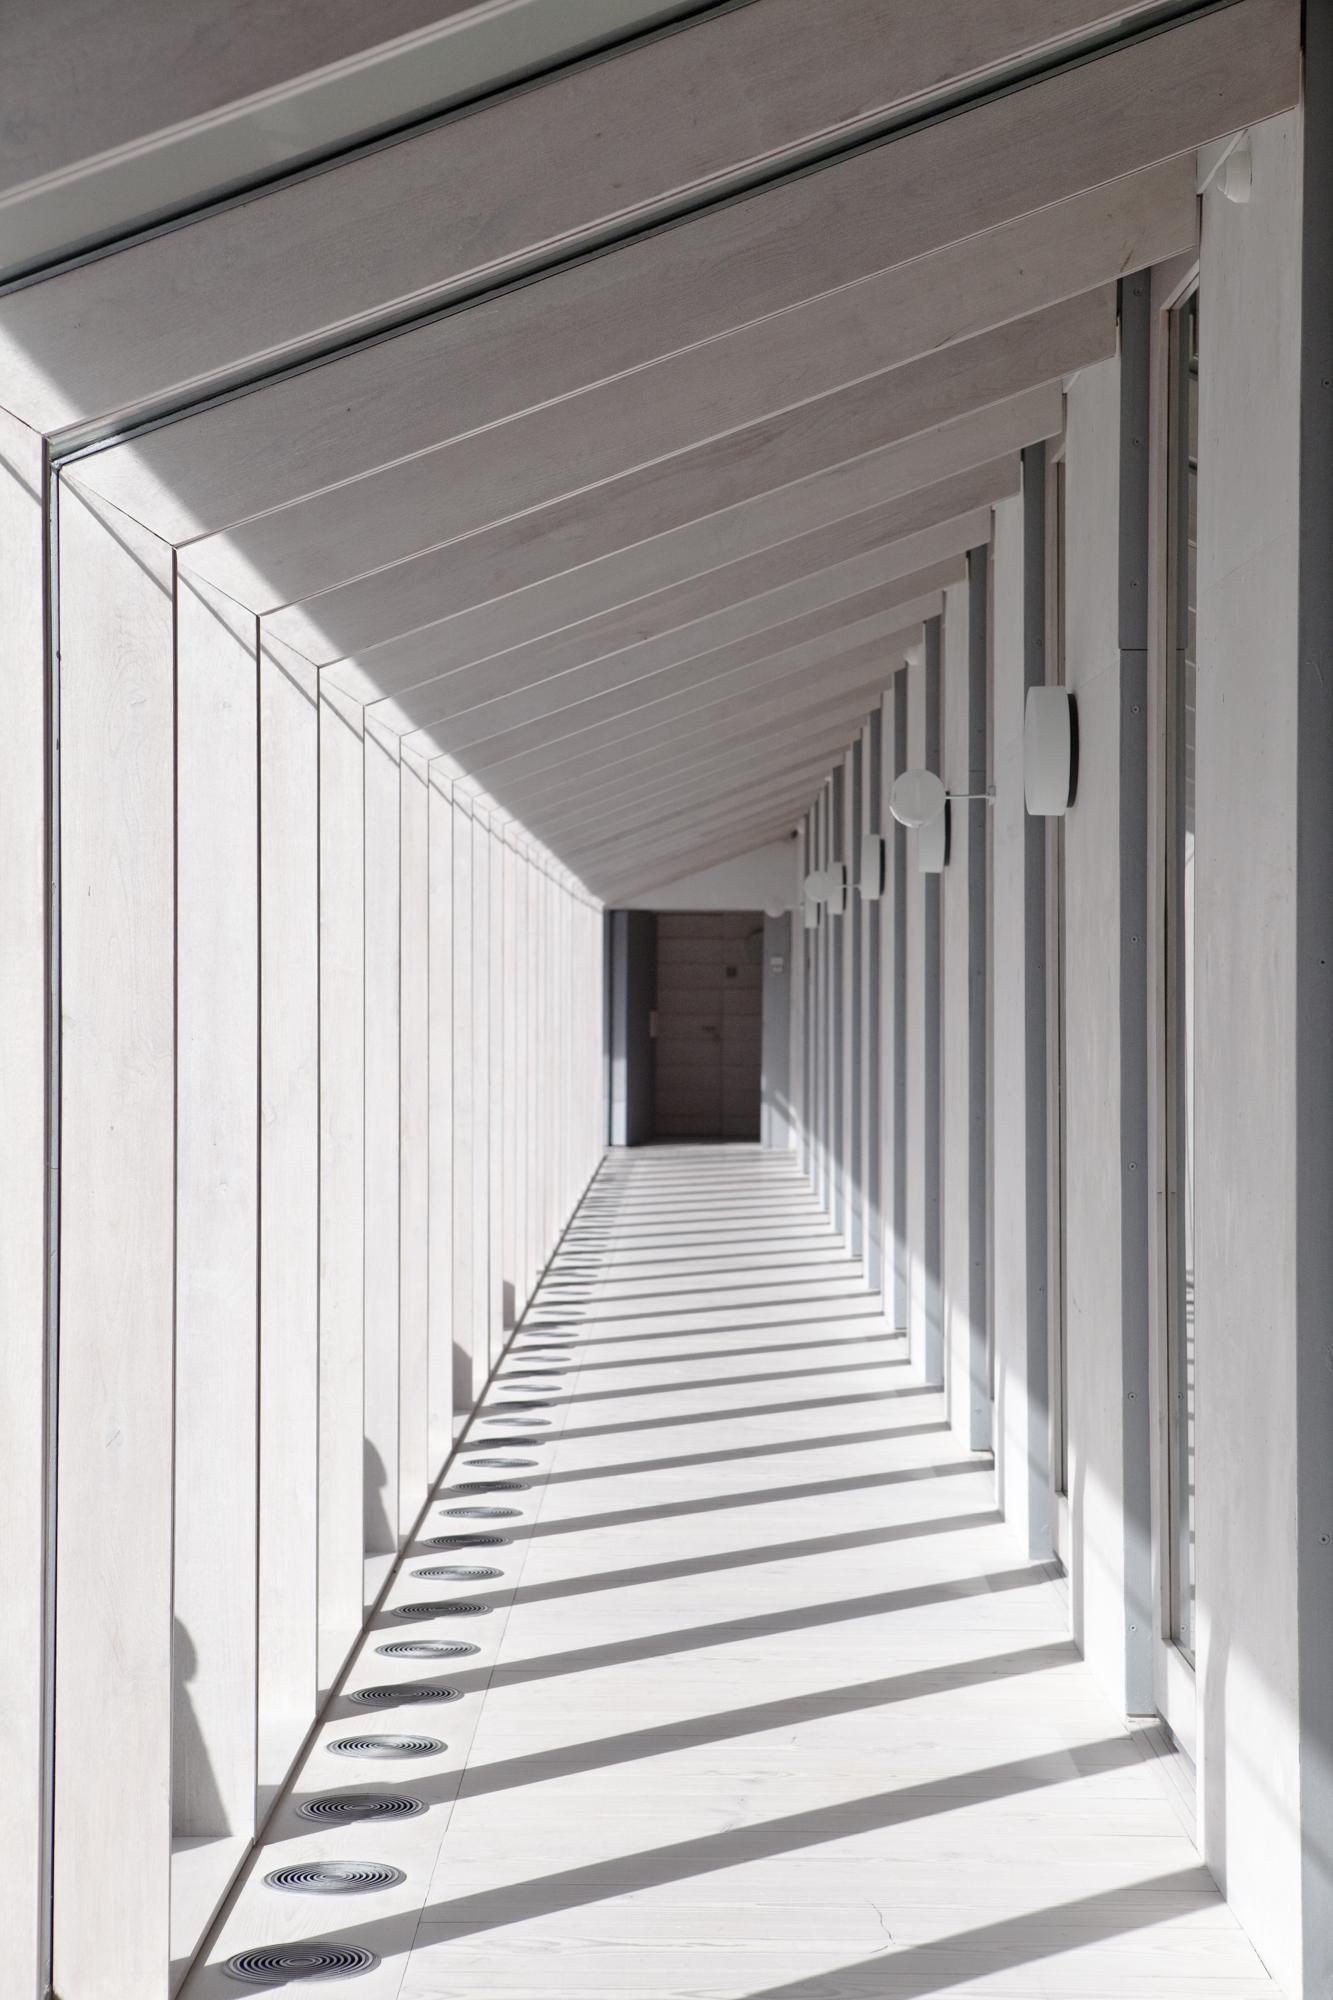 fotografo_interiorismo_arquitectura_Cantabria_14